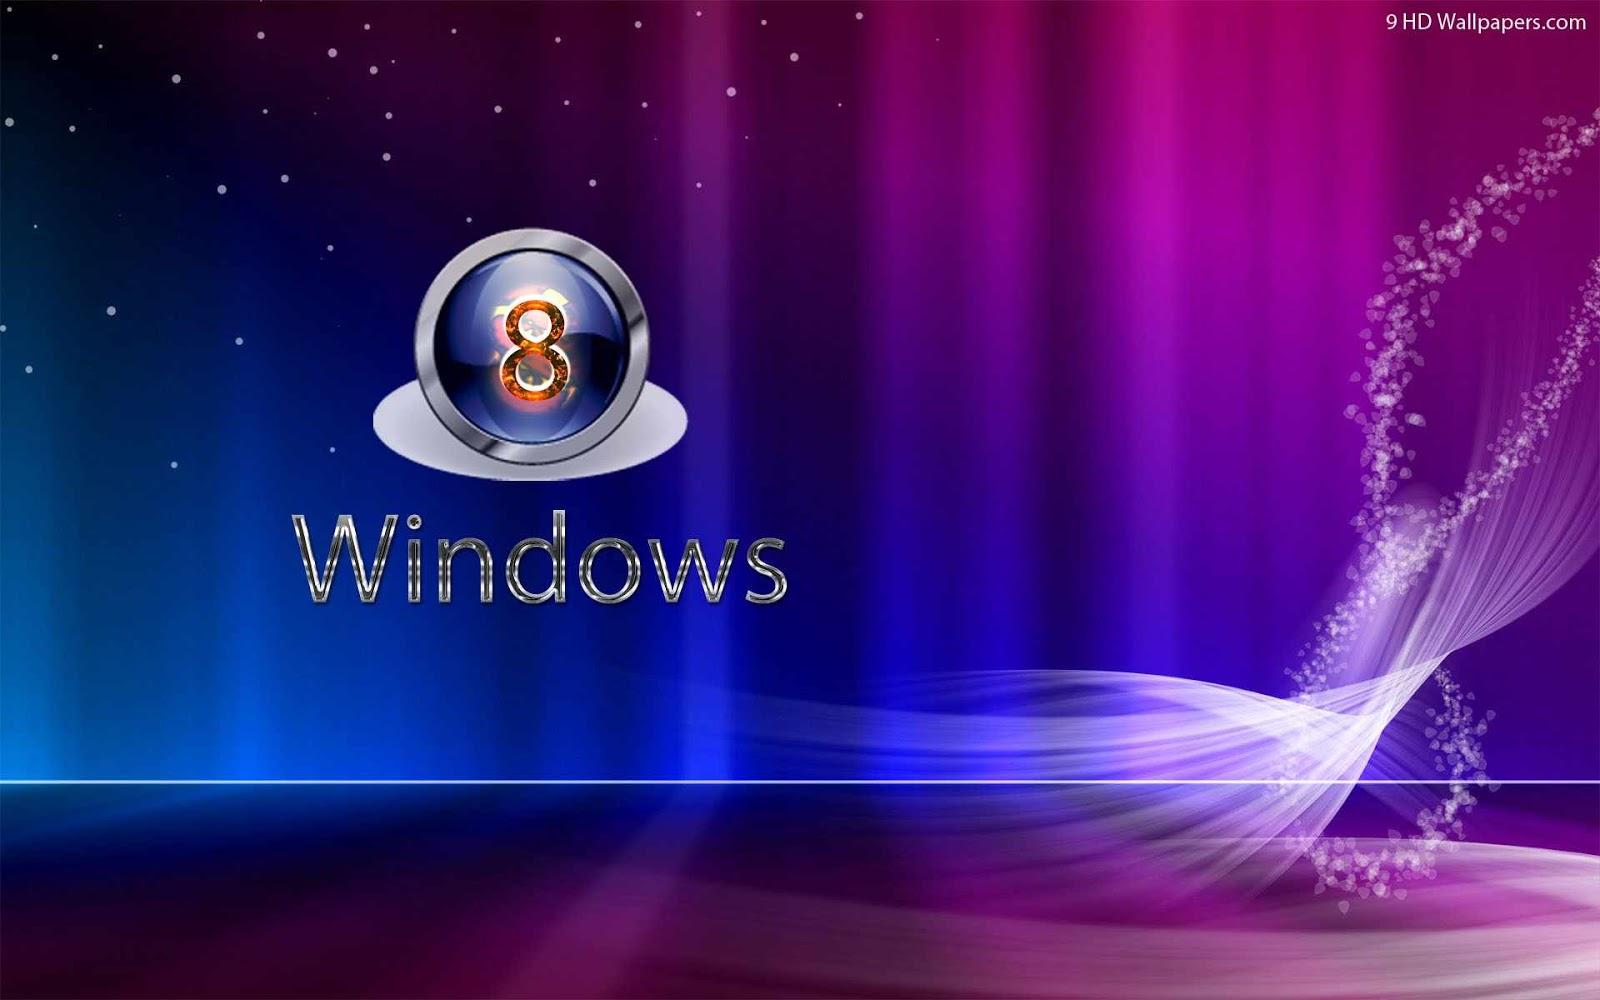 Windows 8 Wallpaper Free Download Wallpapers Hd Desktop: Unique Wallpaper: Super Cool Windows 8 Wallpapers HD